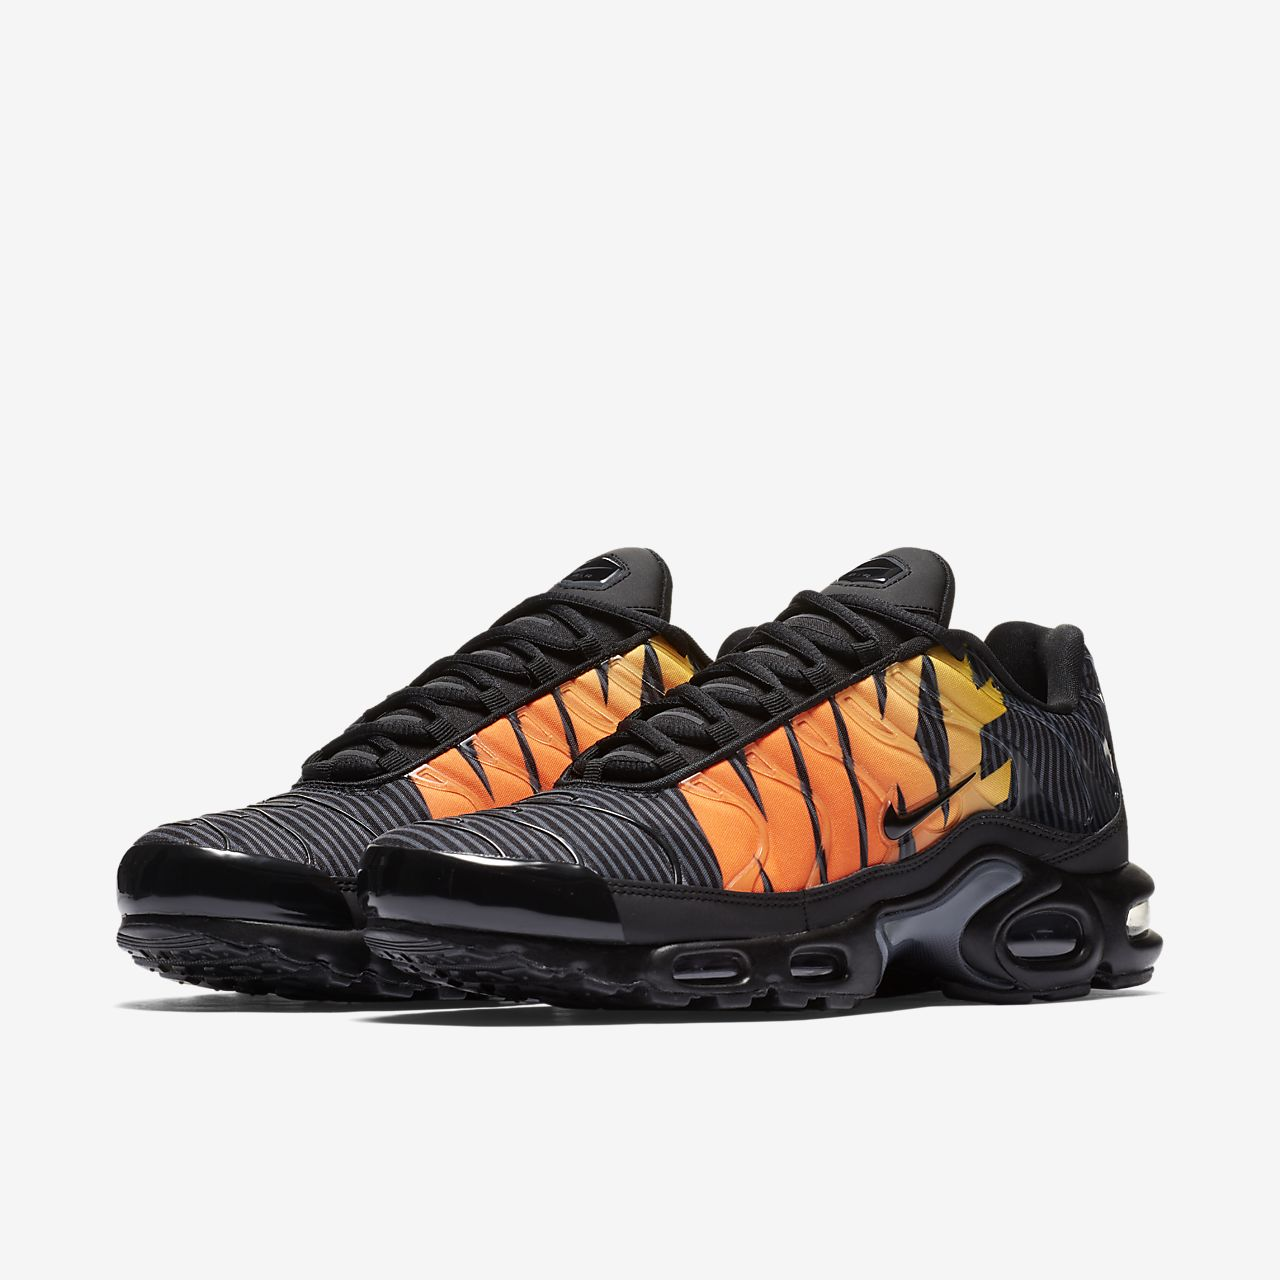 scarpa nike air max plus tn se nerototal orangeanthracite